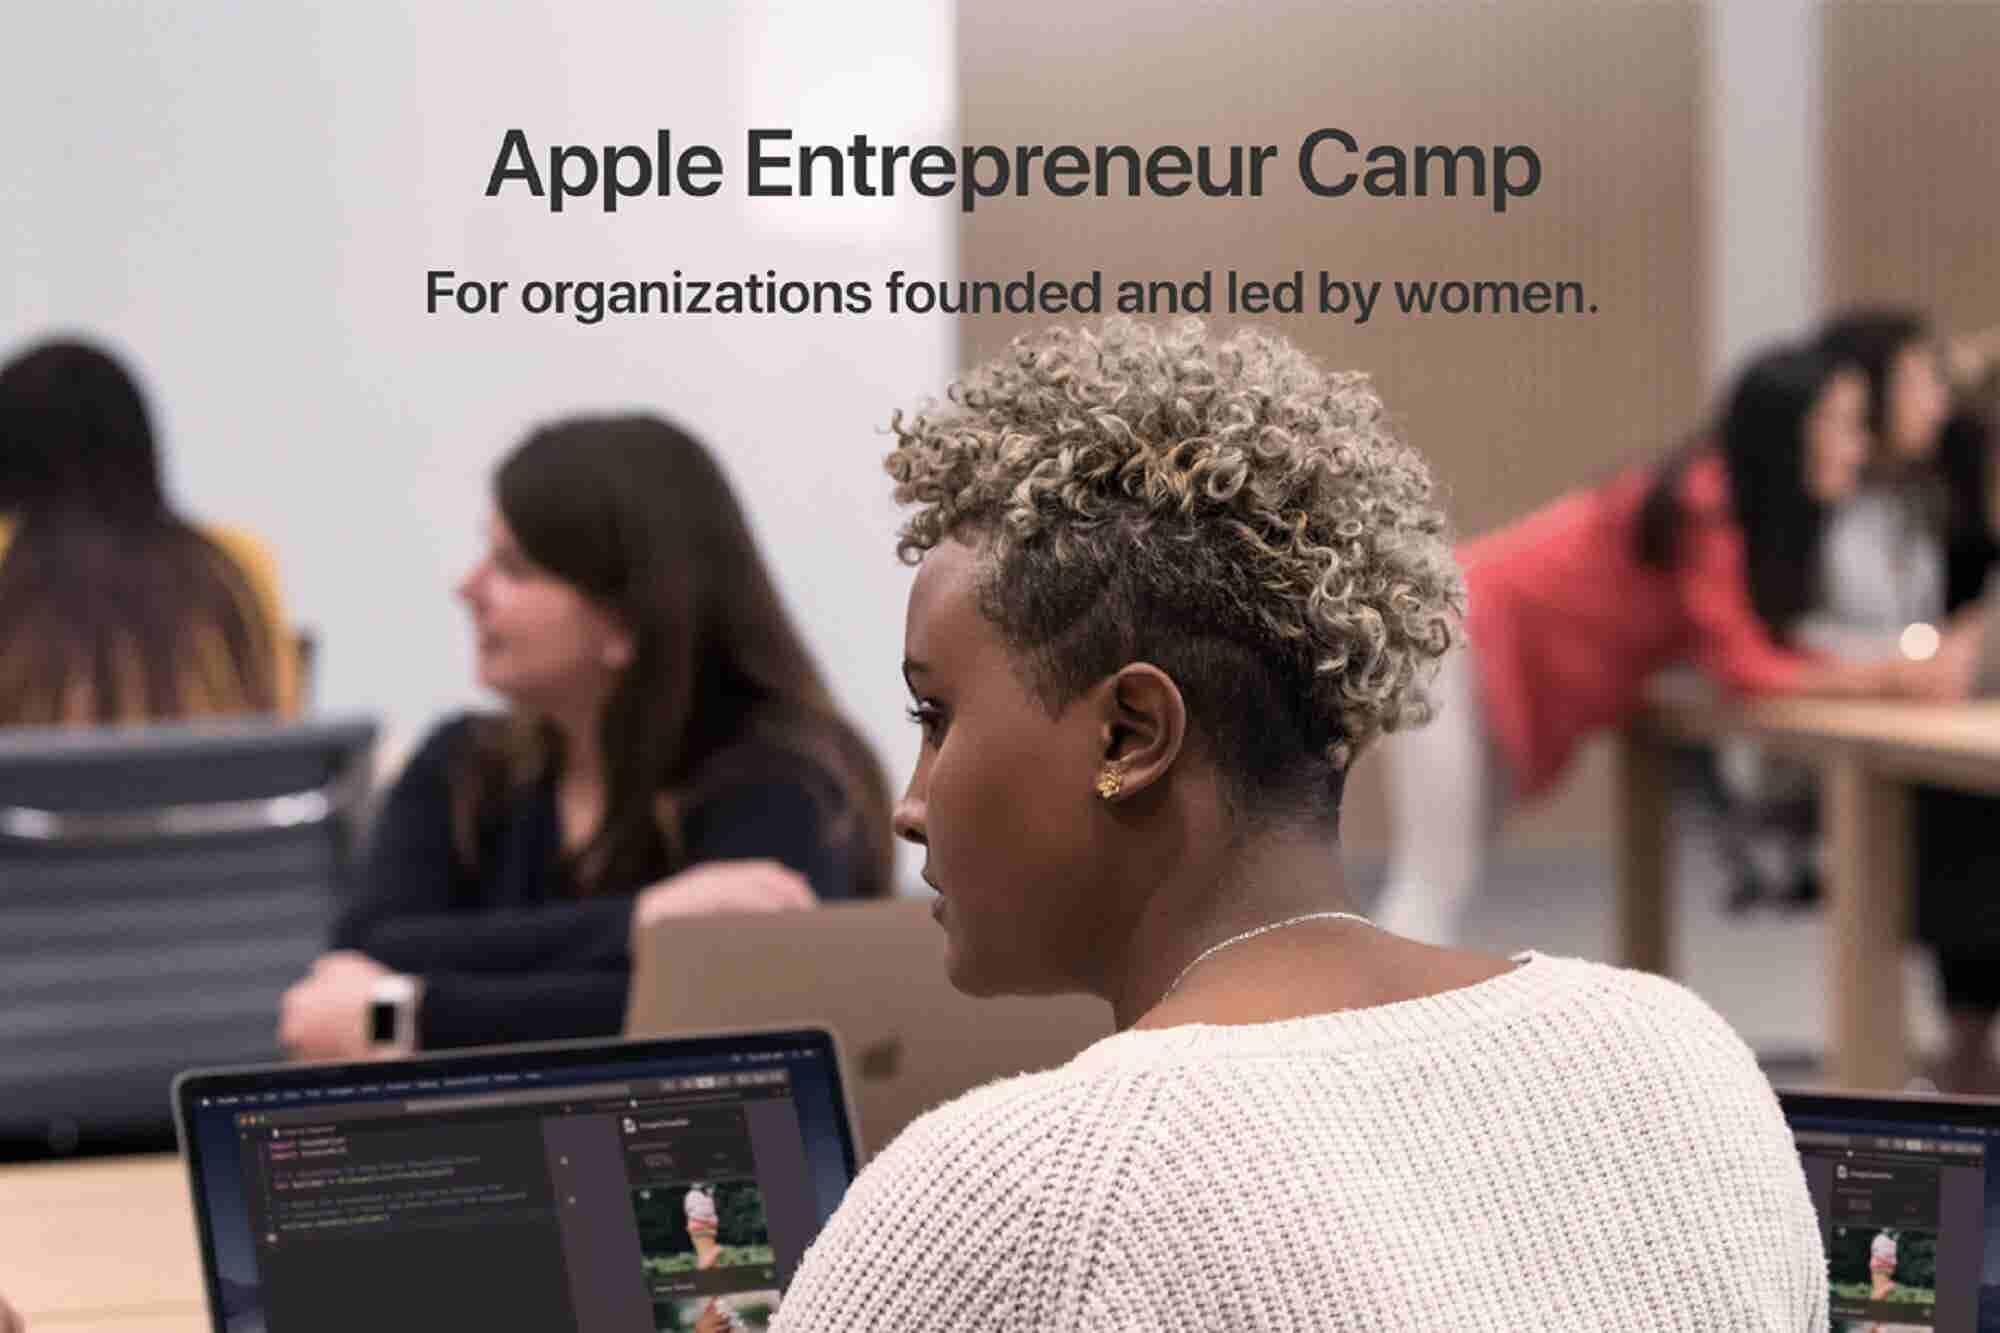 Techie Tuesdays: Apple's Entrepreneur Camp for Women & Facebook's Spoo...